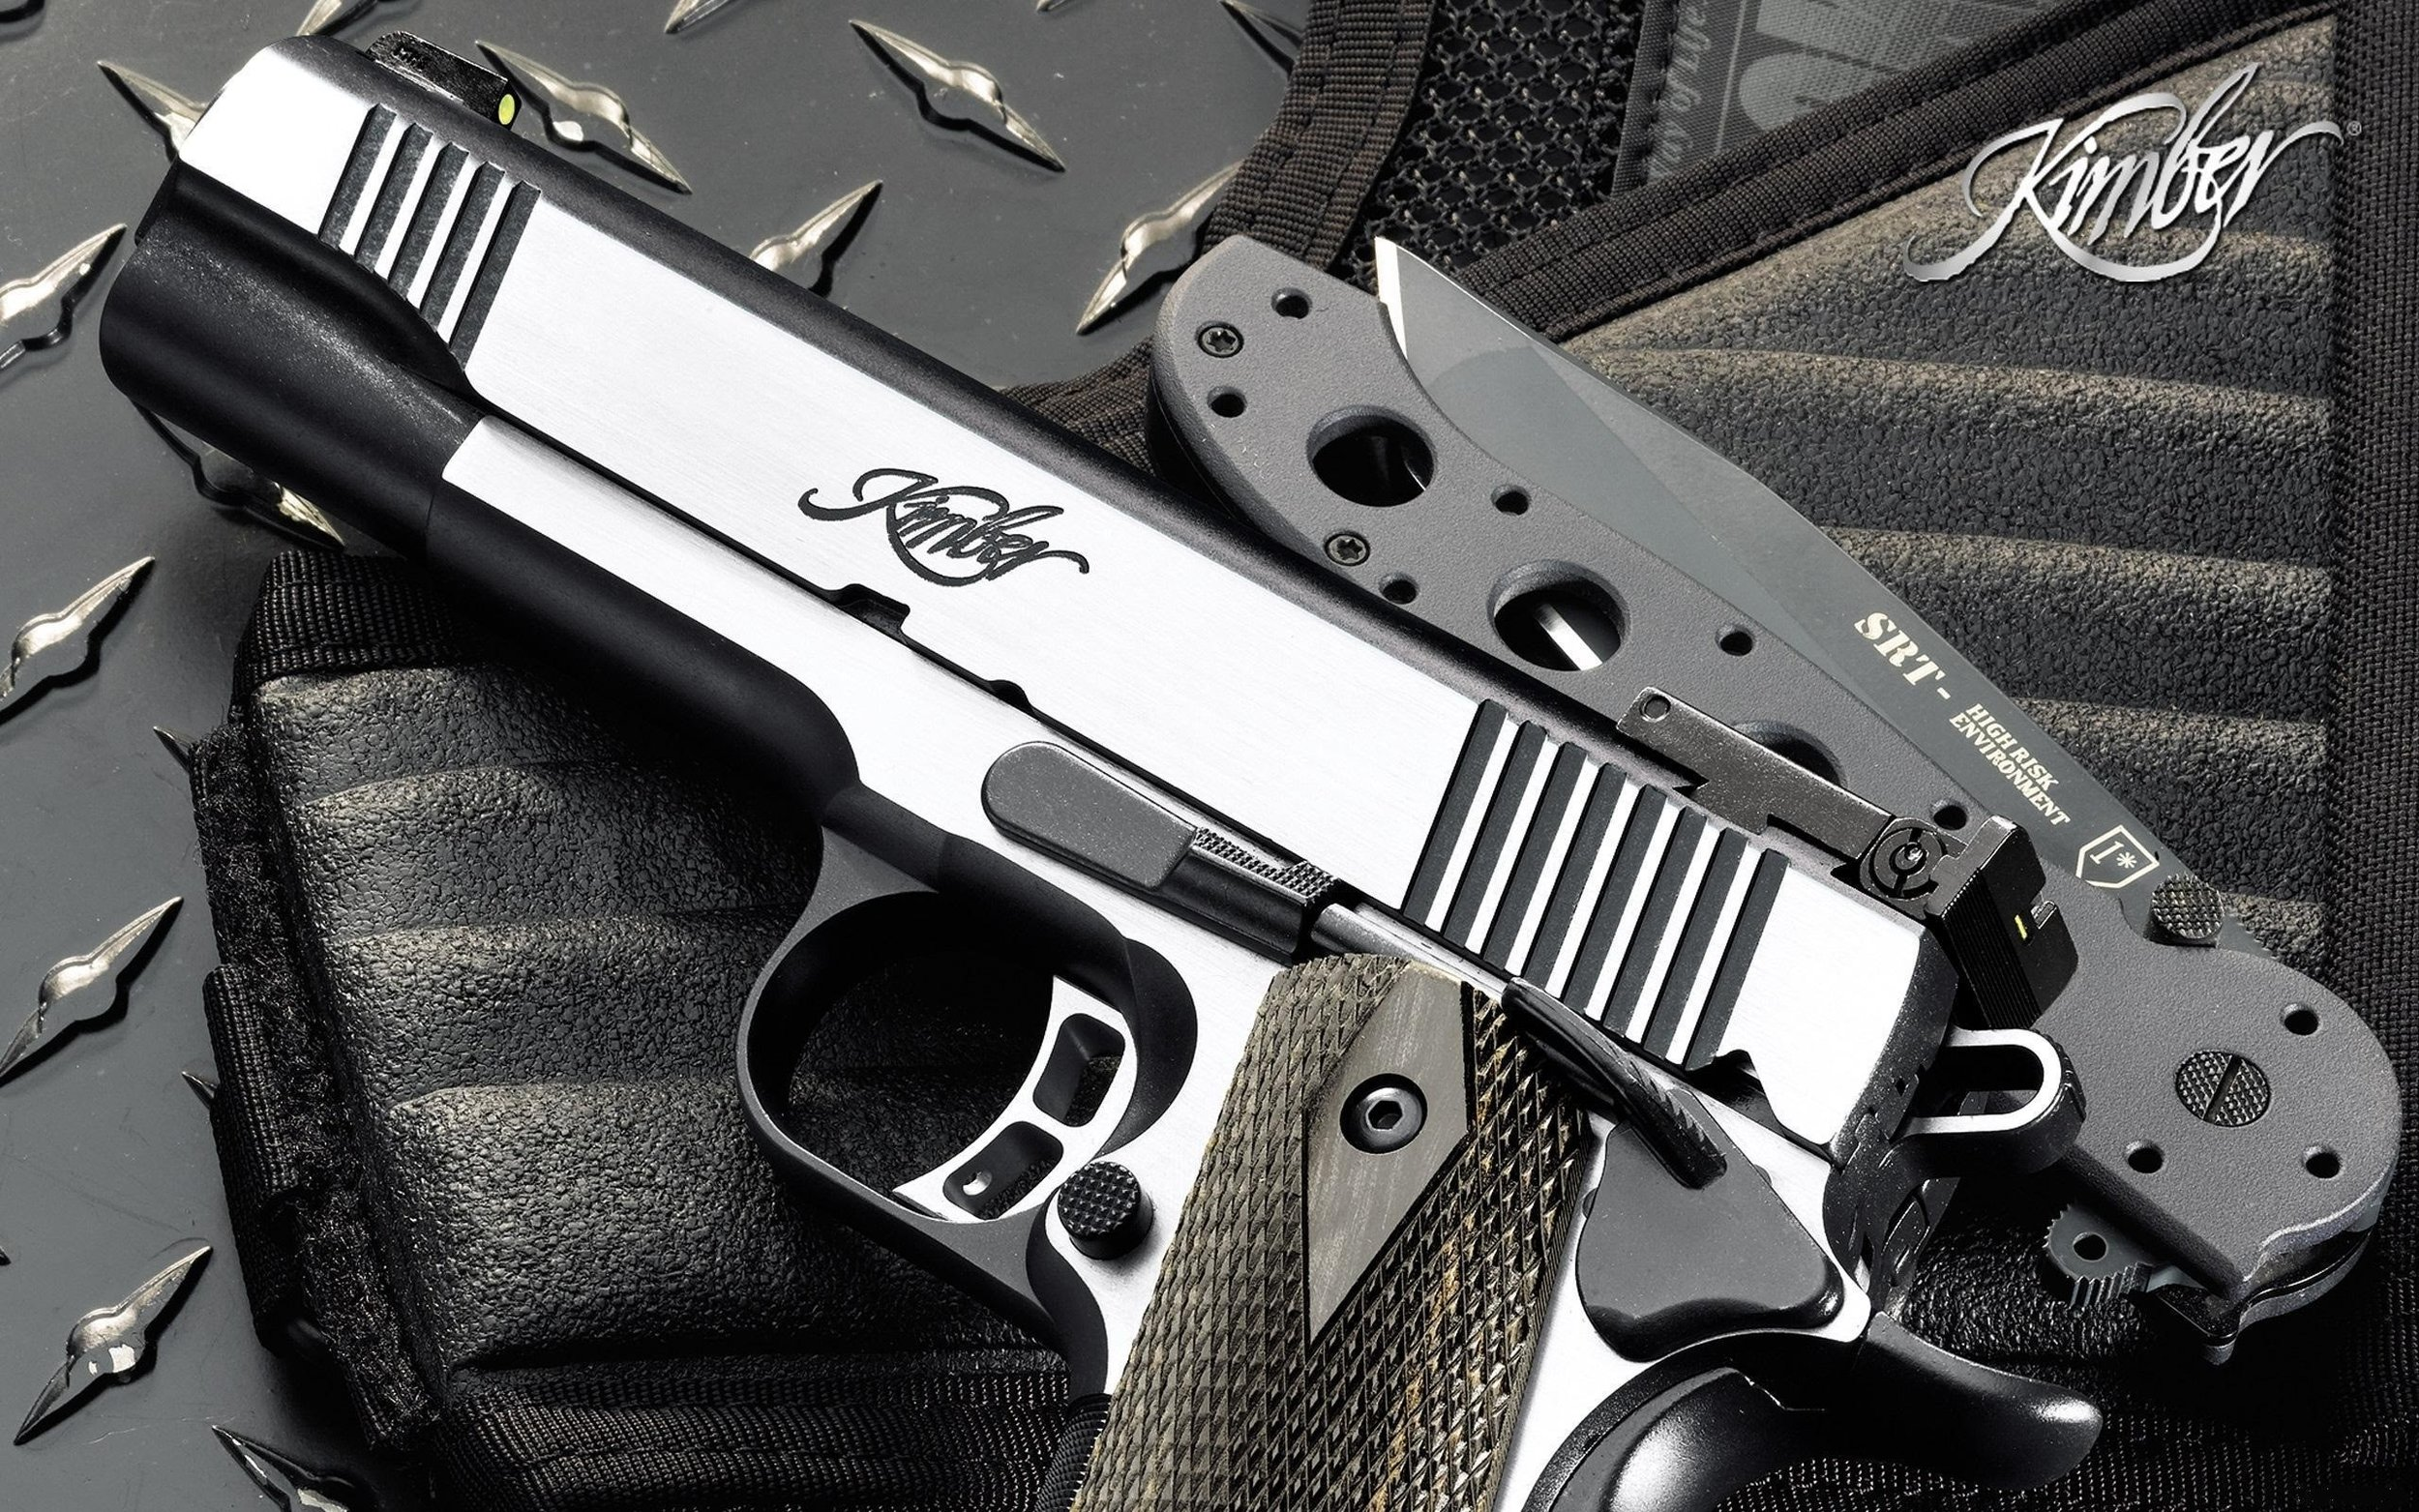 Weapons_Pistol_and_Knife_HD_Desktop_Photos.jpg